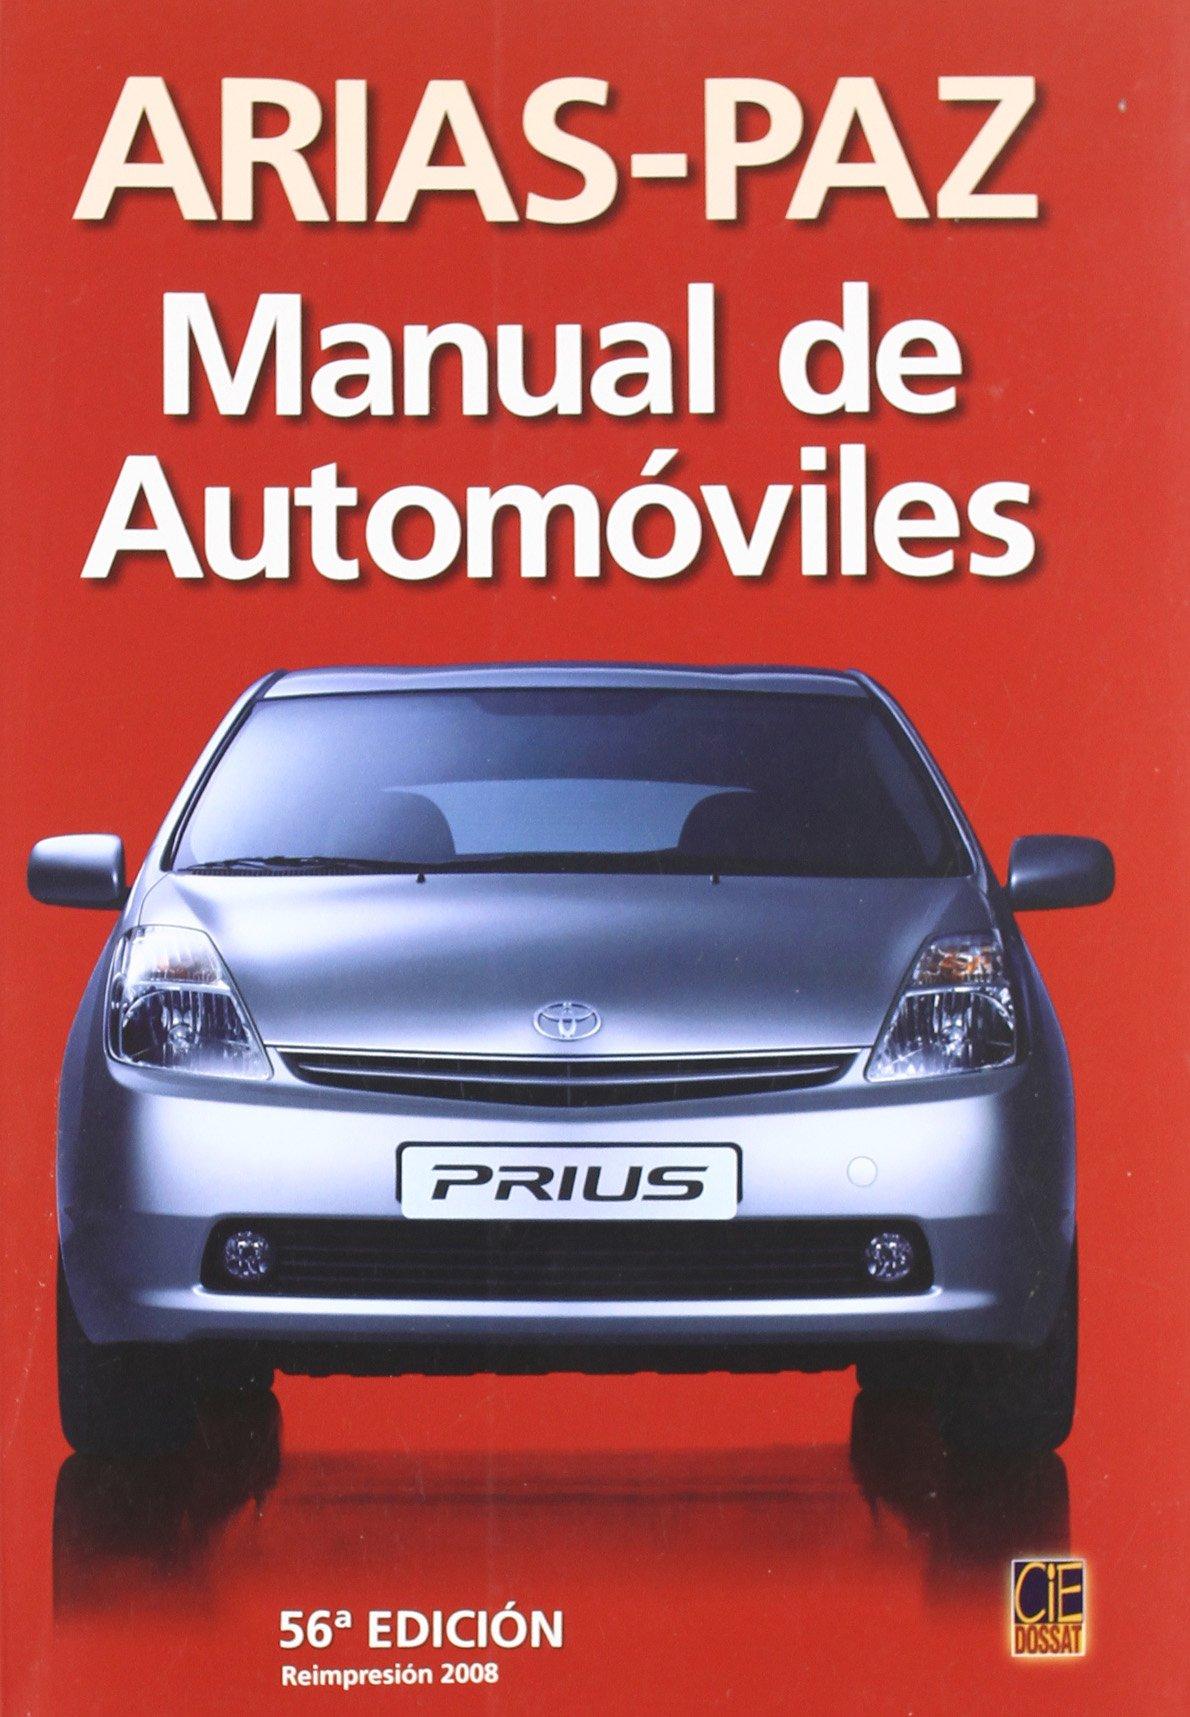 Manual automoviles